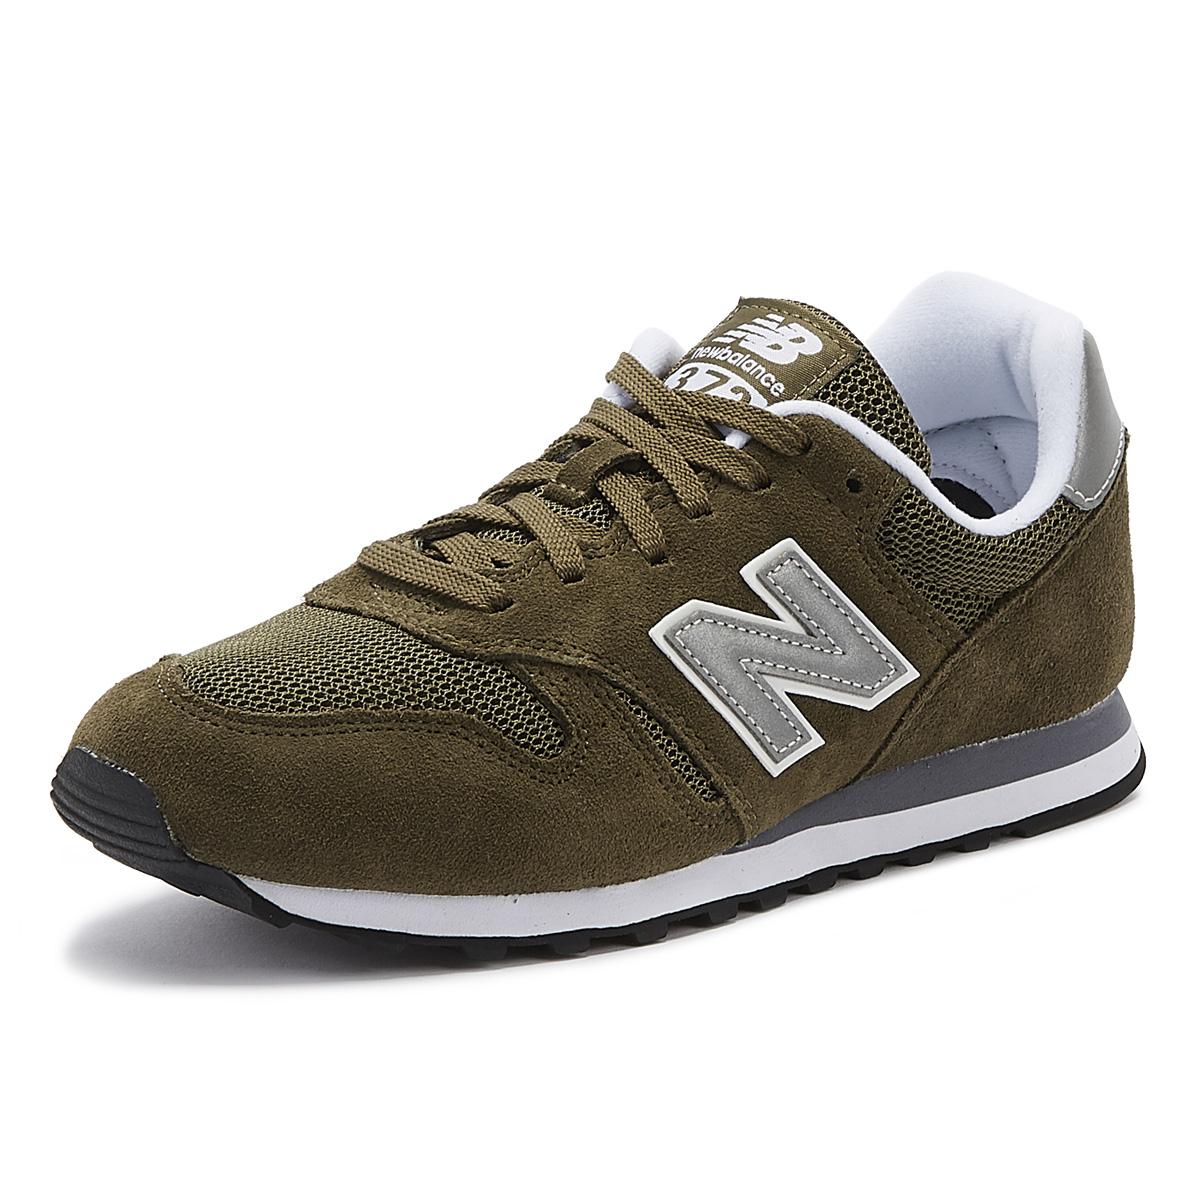 chaussure new balance 373